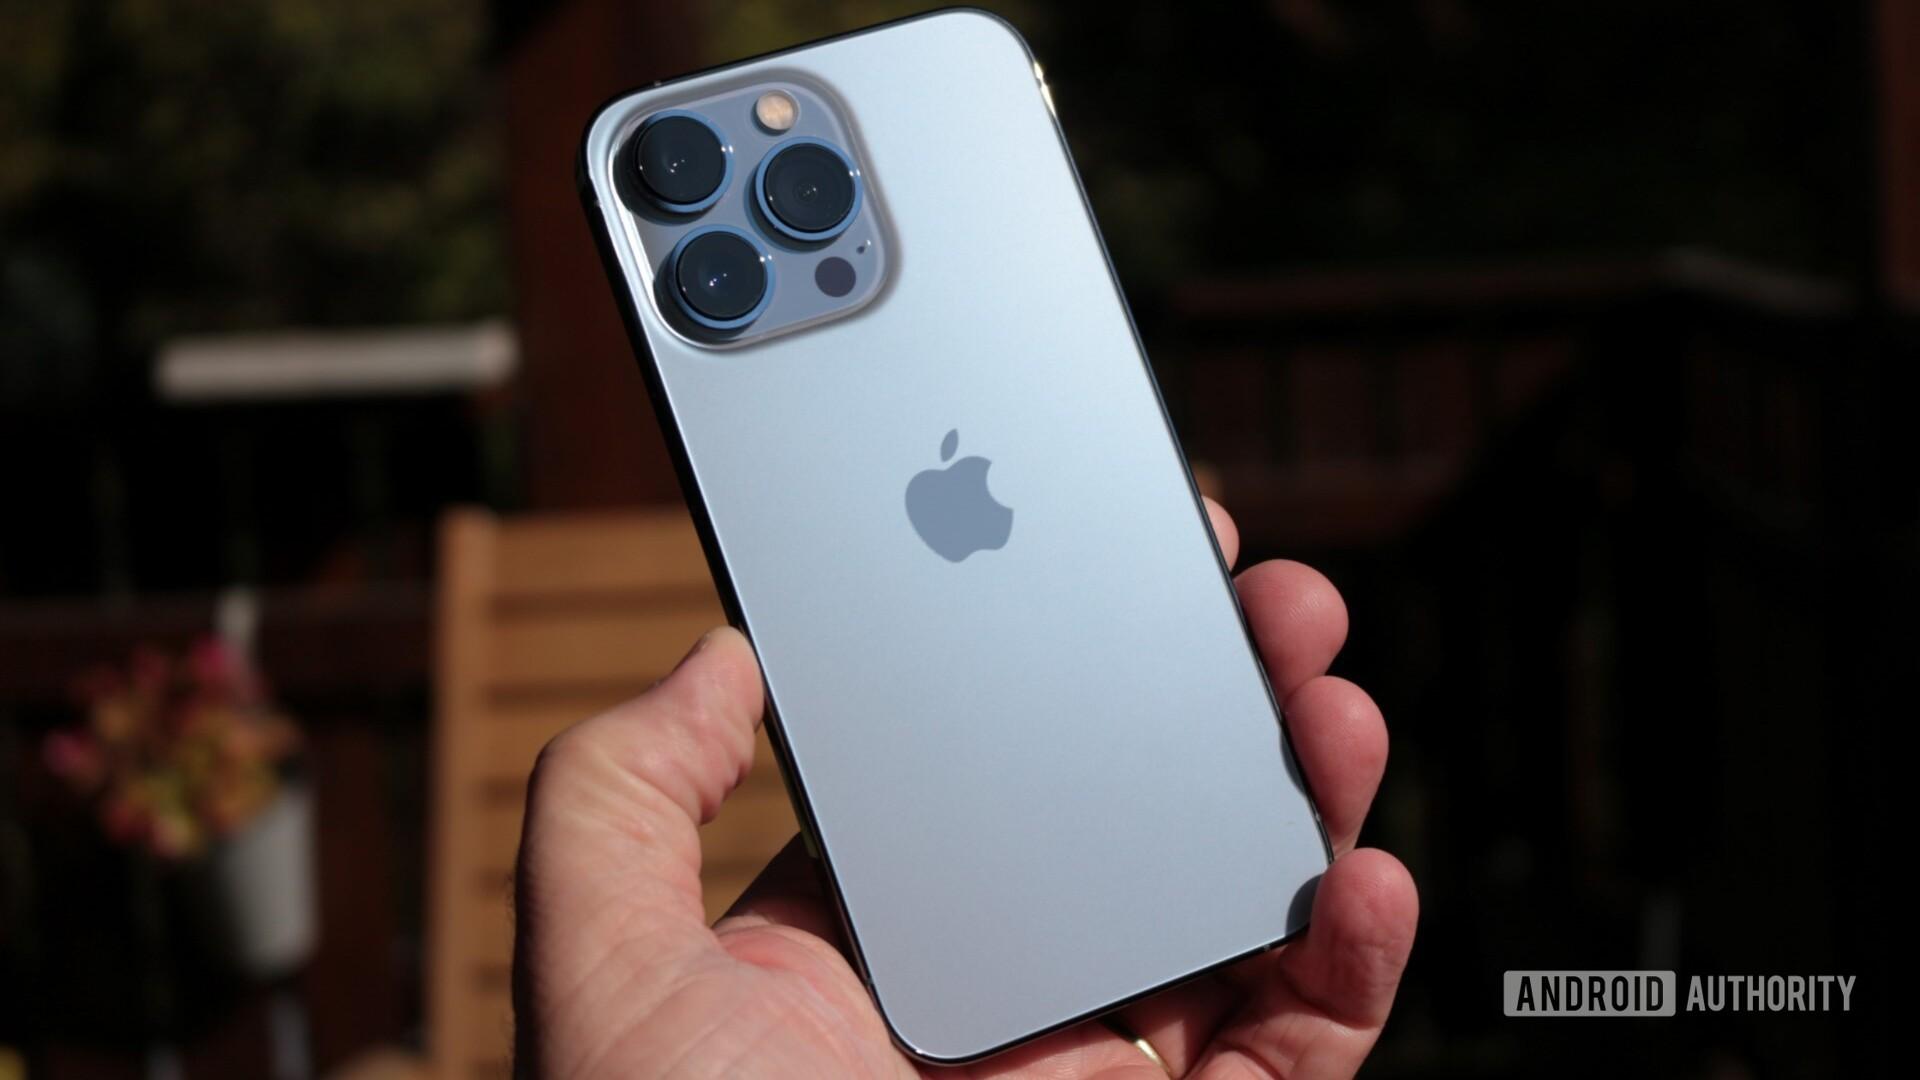 iPhone 13 Pro rear sun glint